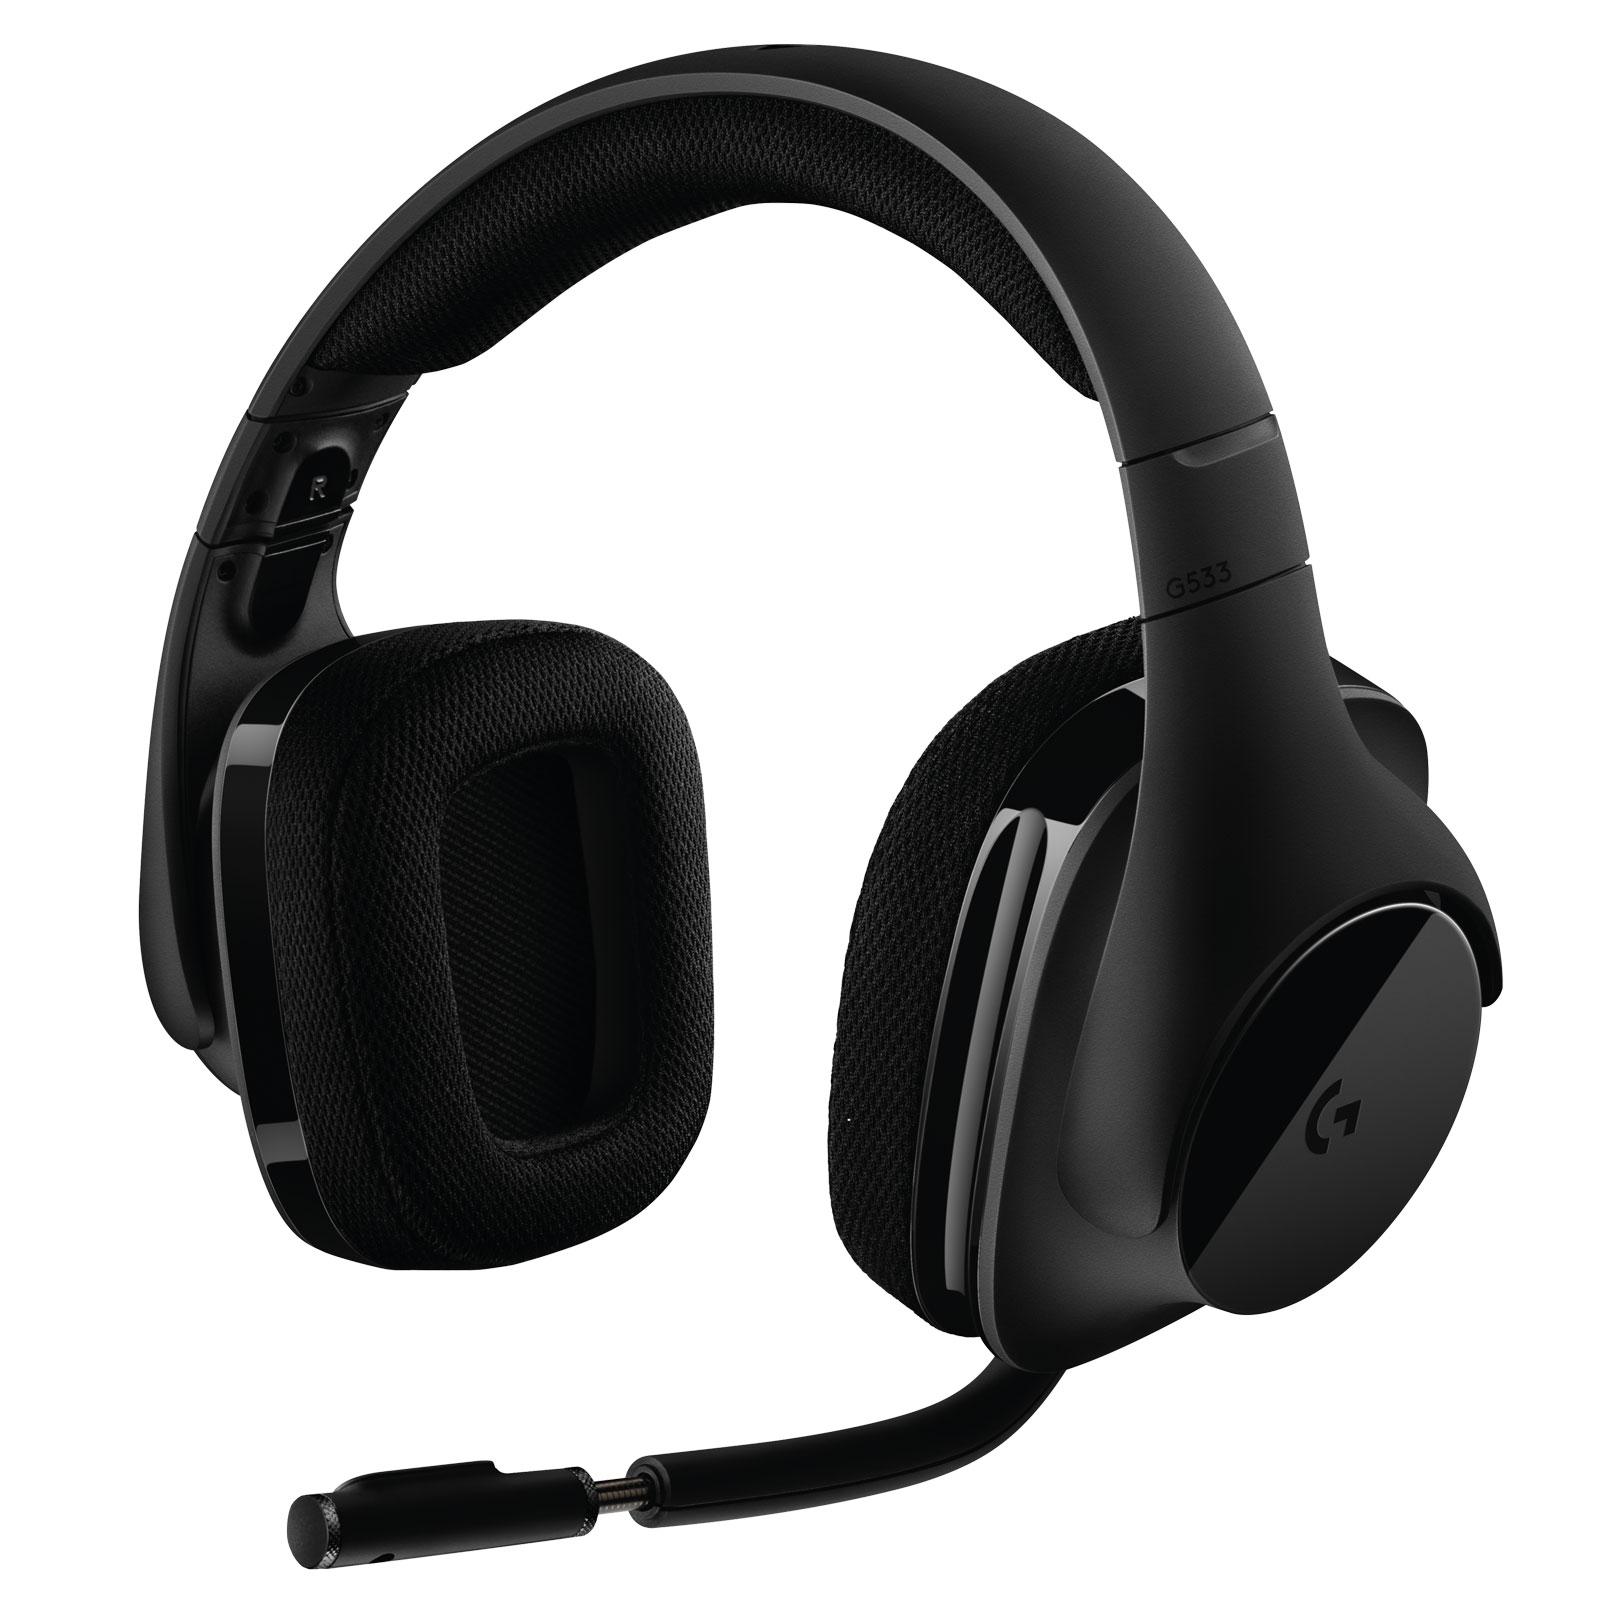 Logitech G533 Prodigy Wireless Gaming Headset 7.1 Surround - Micro-casque - 0